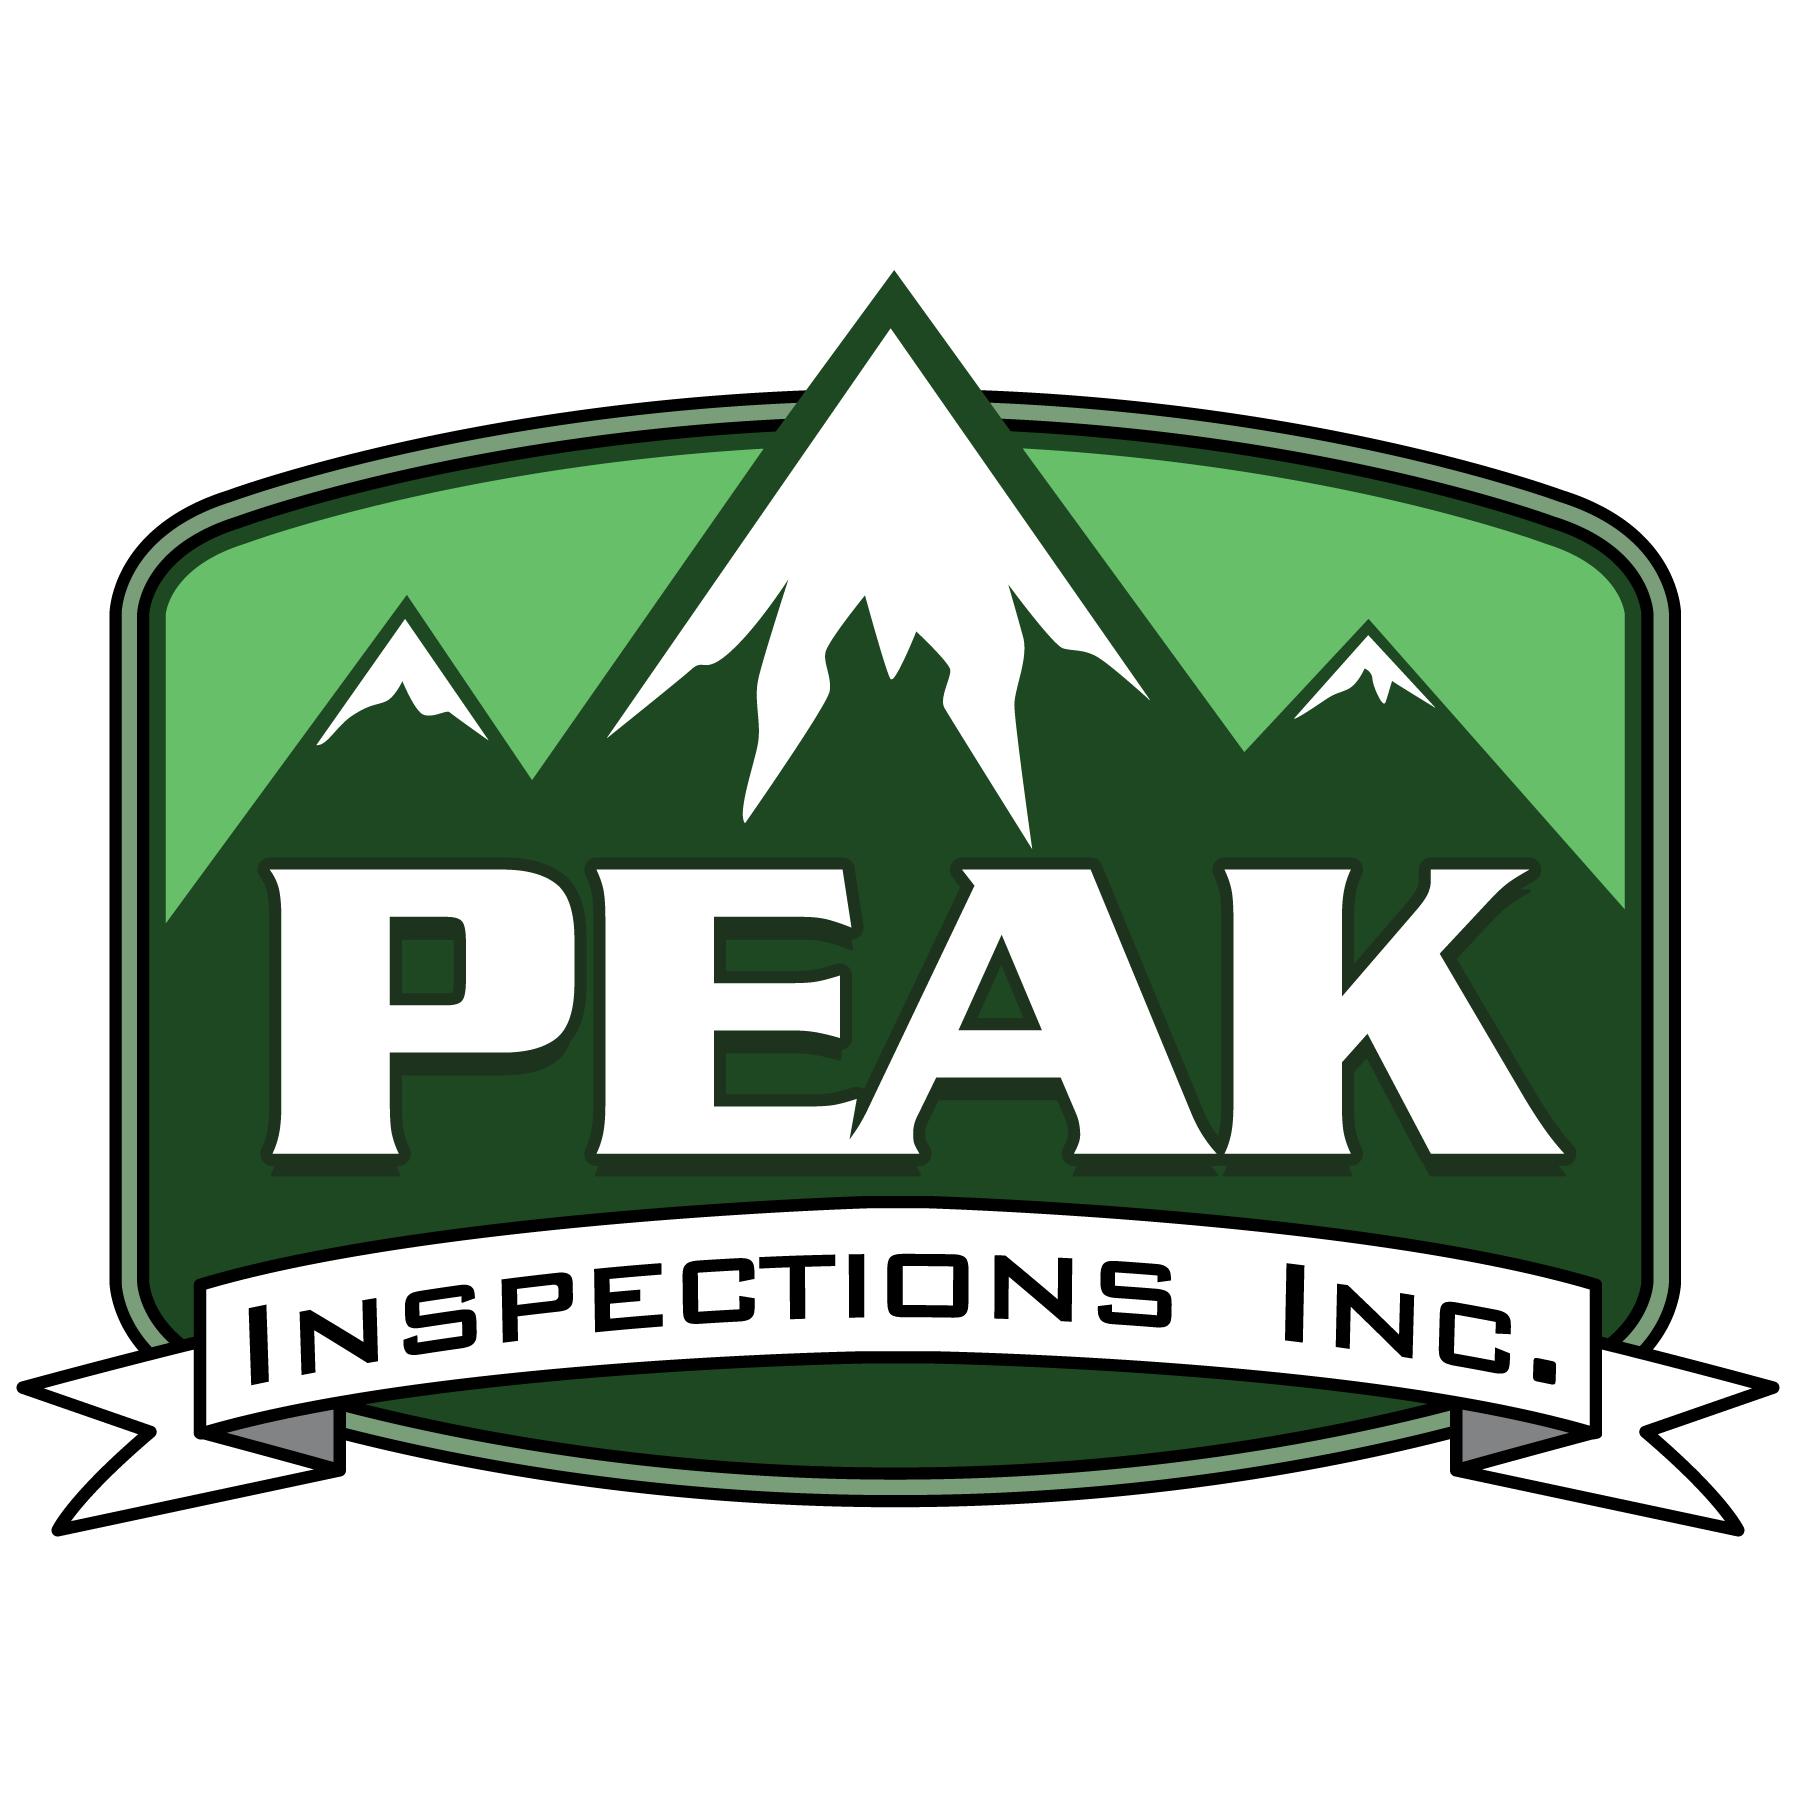 Peak Inspections Inc. image 2